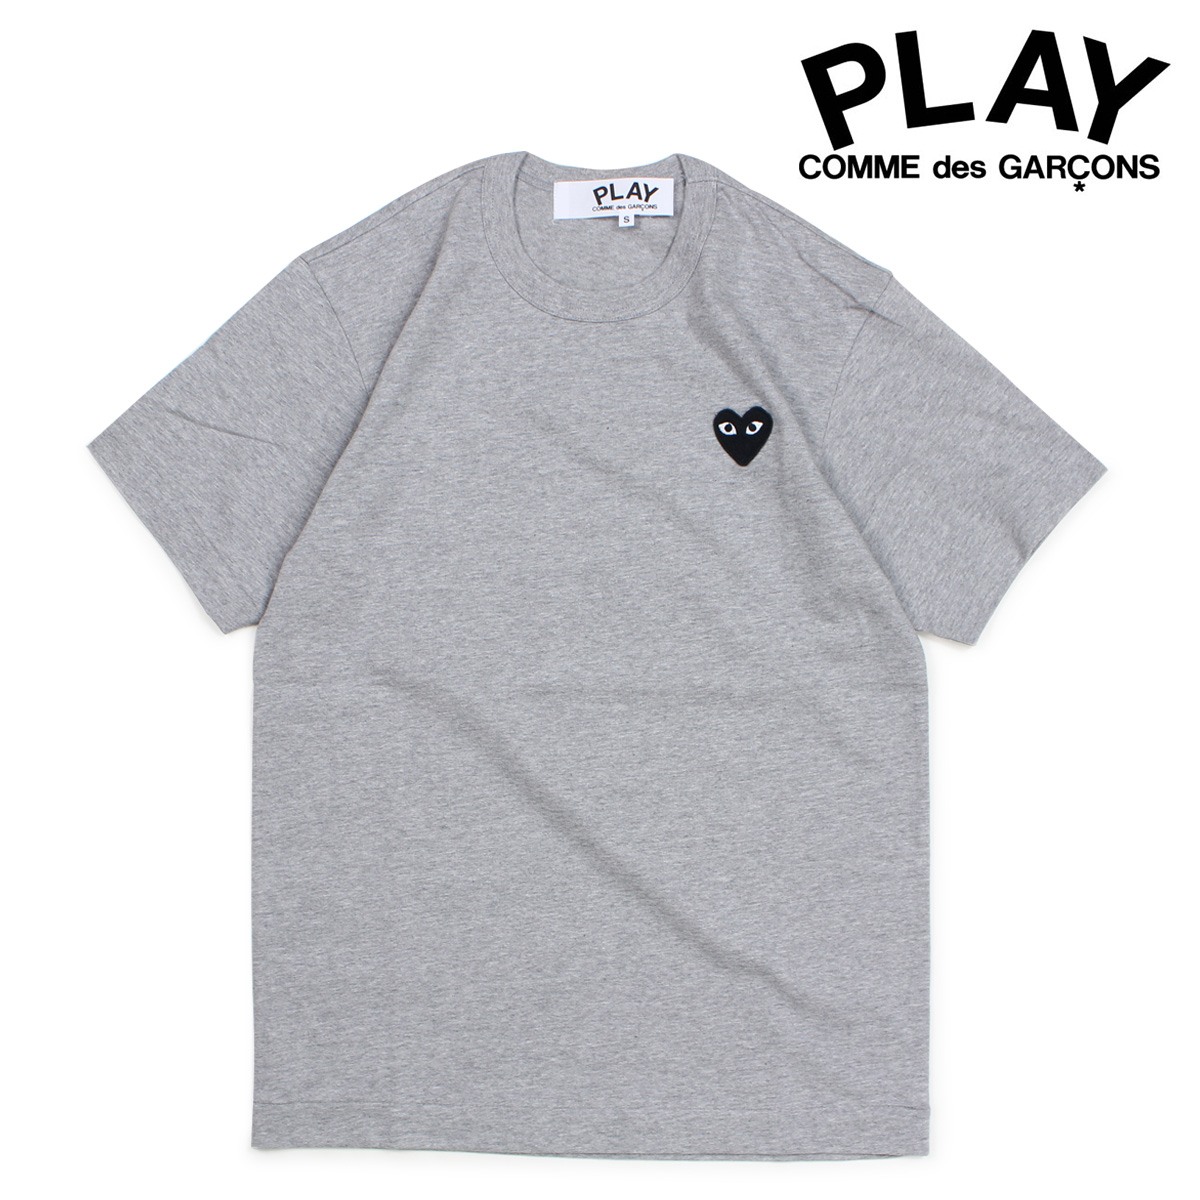 COMME des GARCONS PLAY Tシャツ 半袖 コムデギャルソン メンズ BLACK HEART T-SHIRT グレー AZT076 [10/3 新入荷]